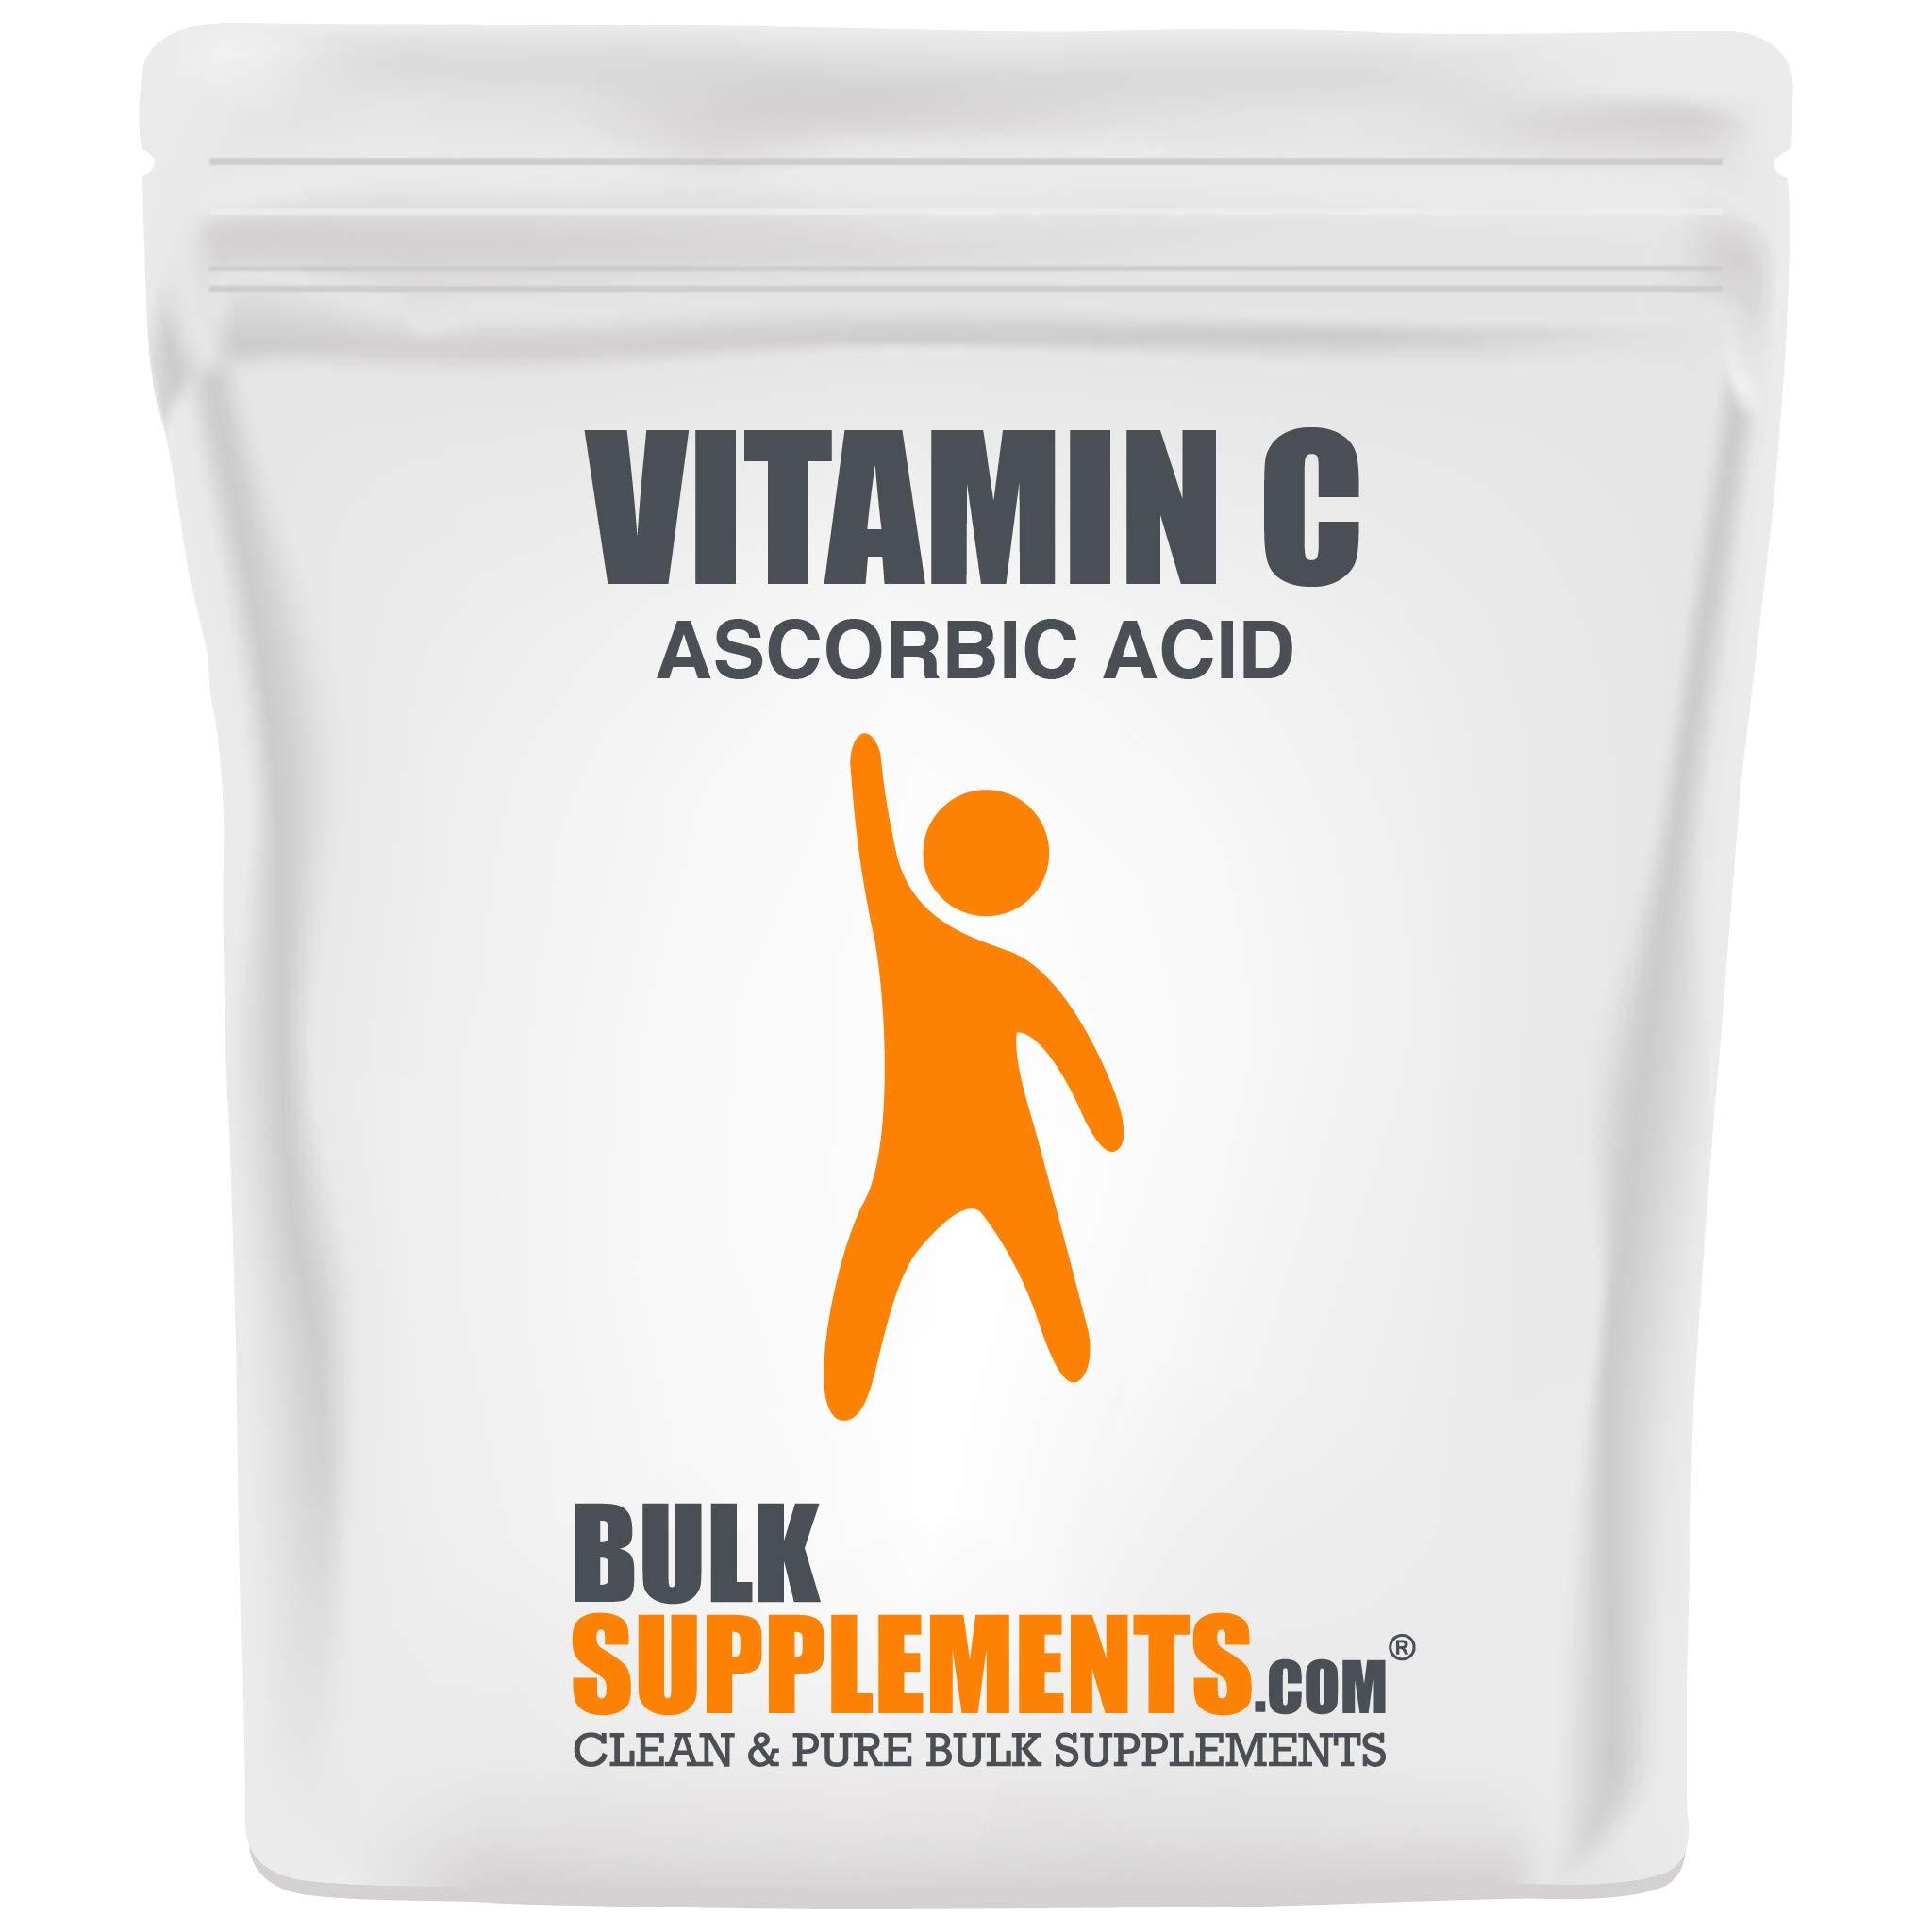 BulkSupplements.com Vitamin C Powder - Ascorbic Acid Vitamin C - Vitamin C Supplement - Ascorbic Acid Powder (1 Kilogram - 2.2 lbs - 1333 Servings)